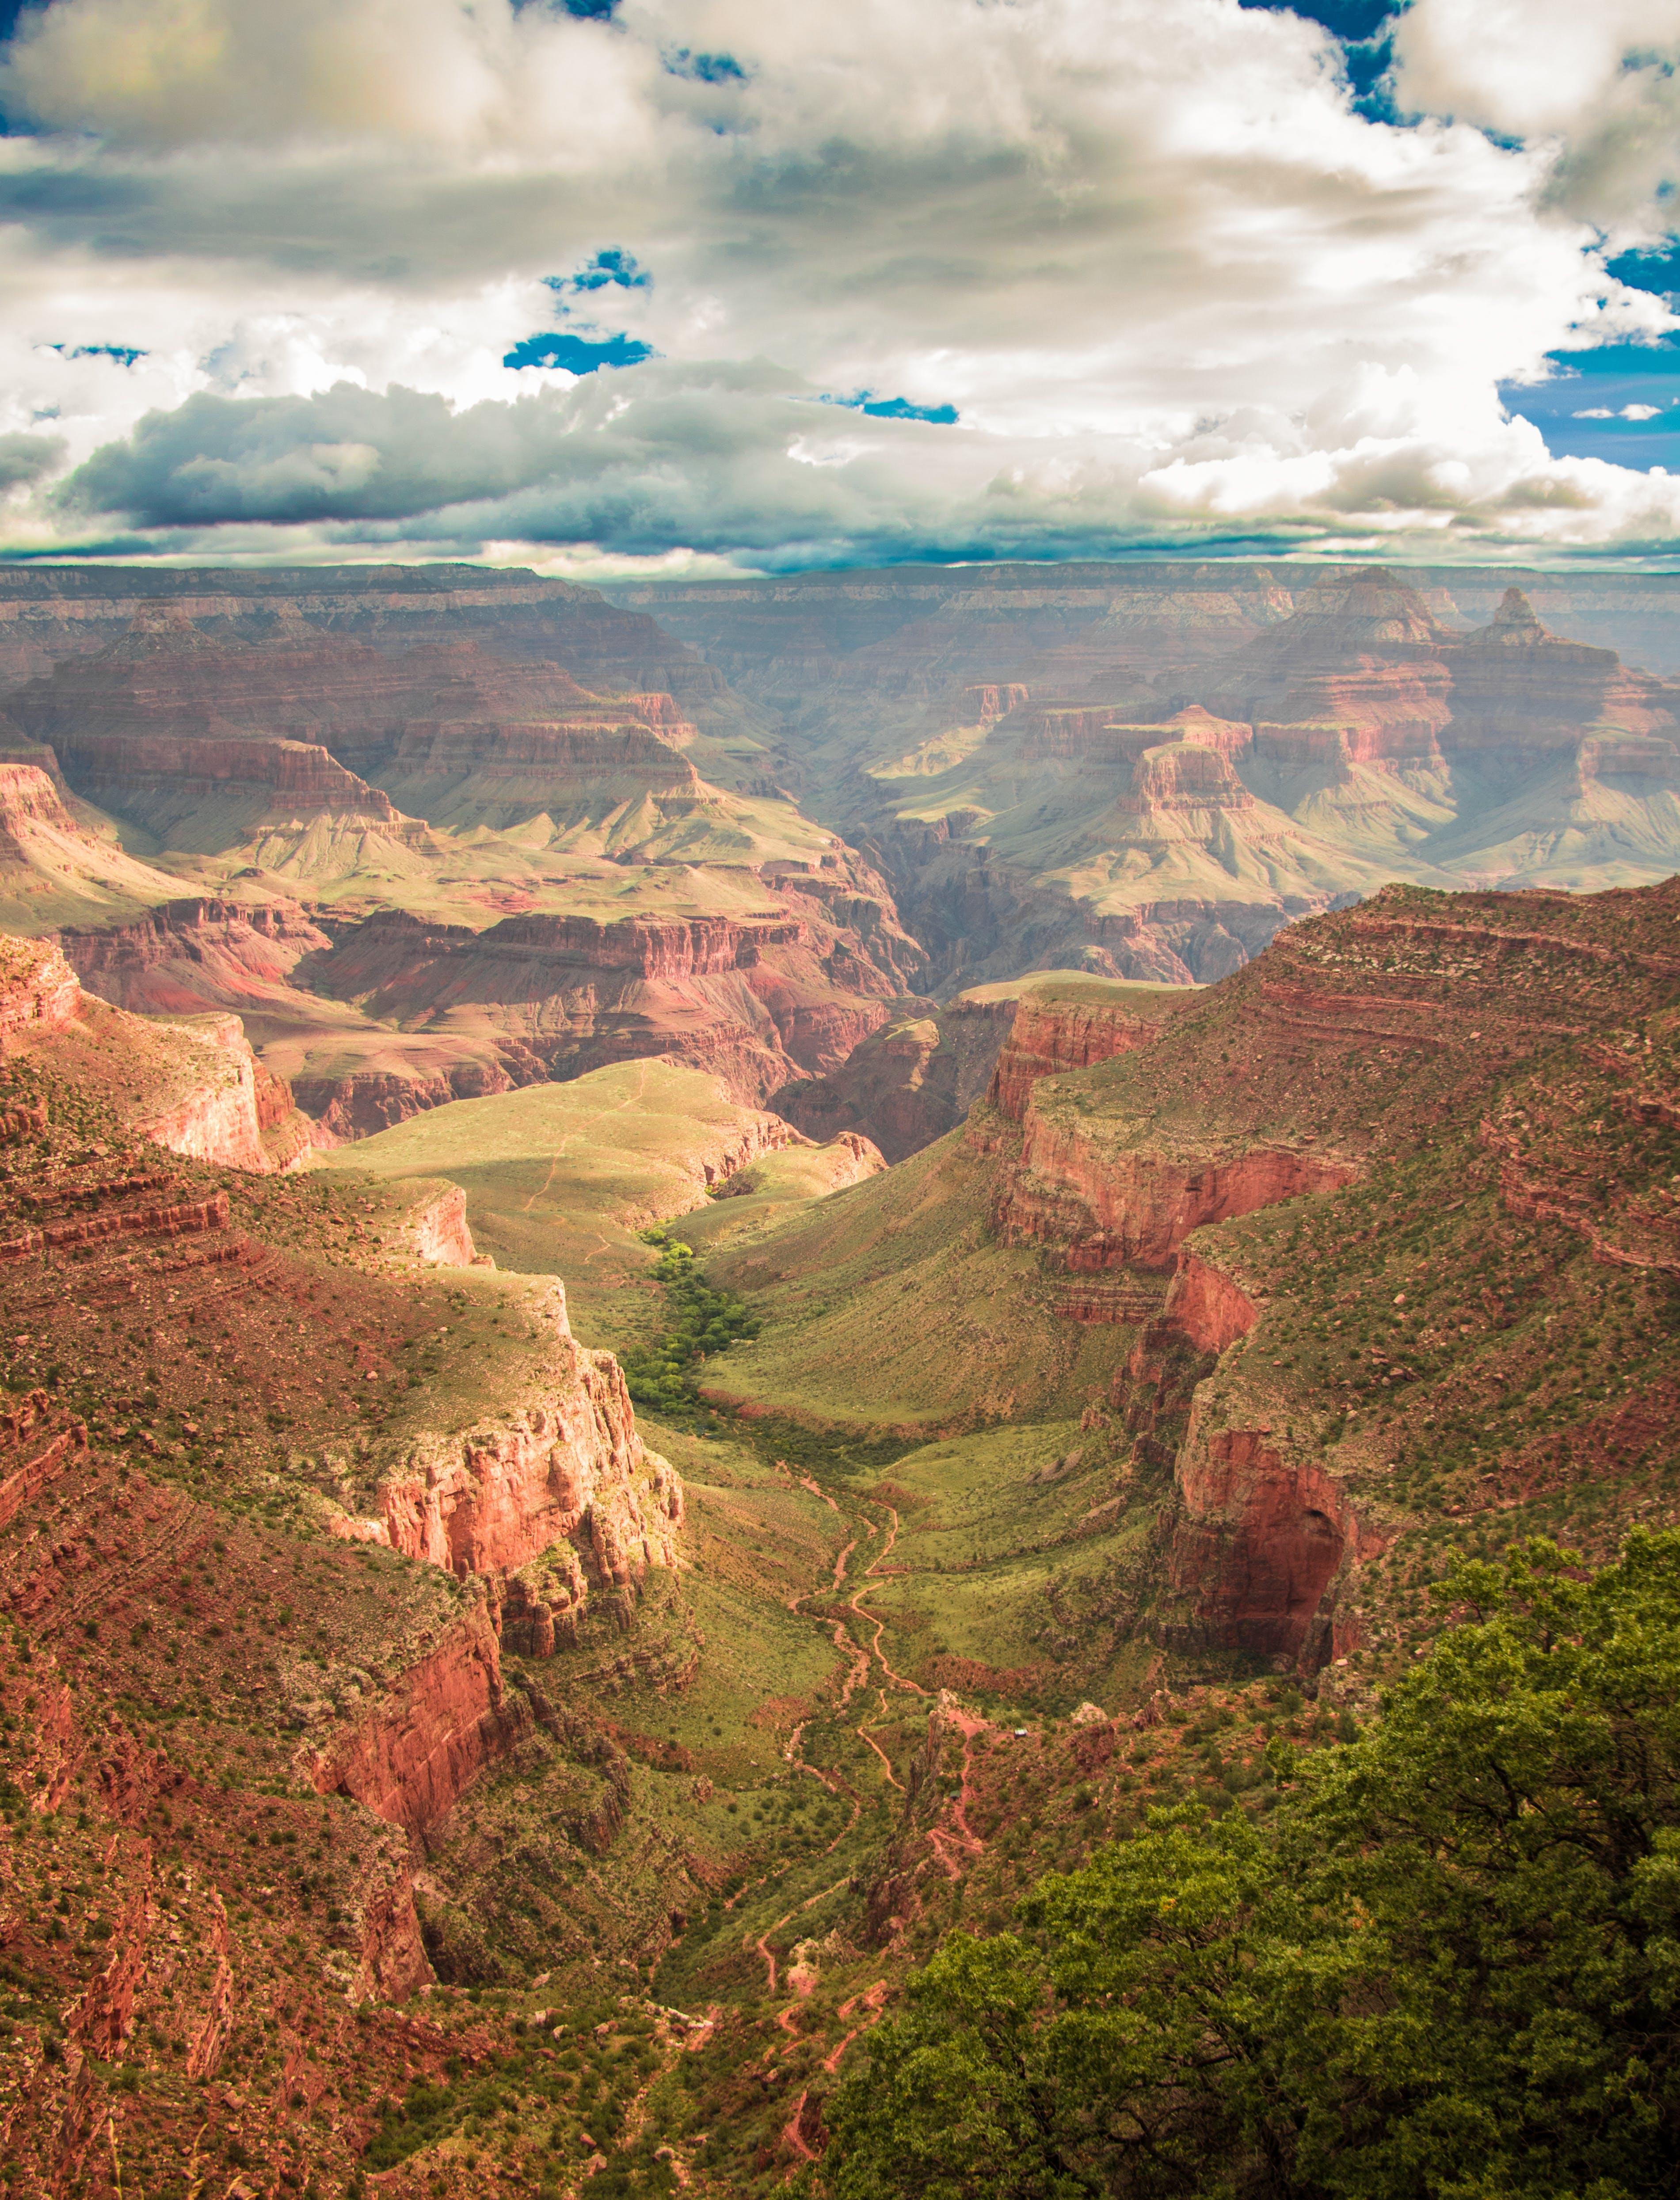 Bird's-eye Photography of Brown Rock Plateau